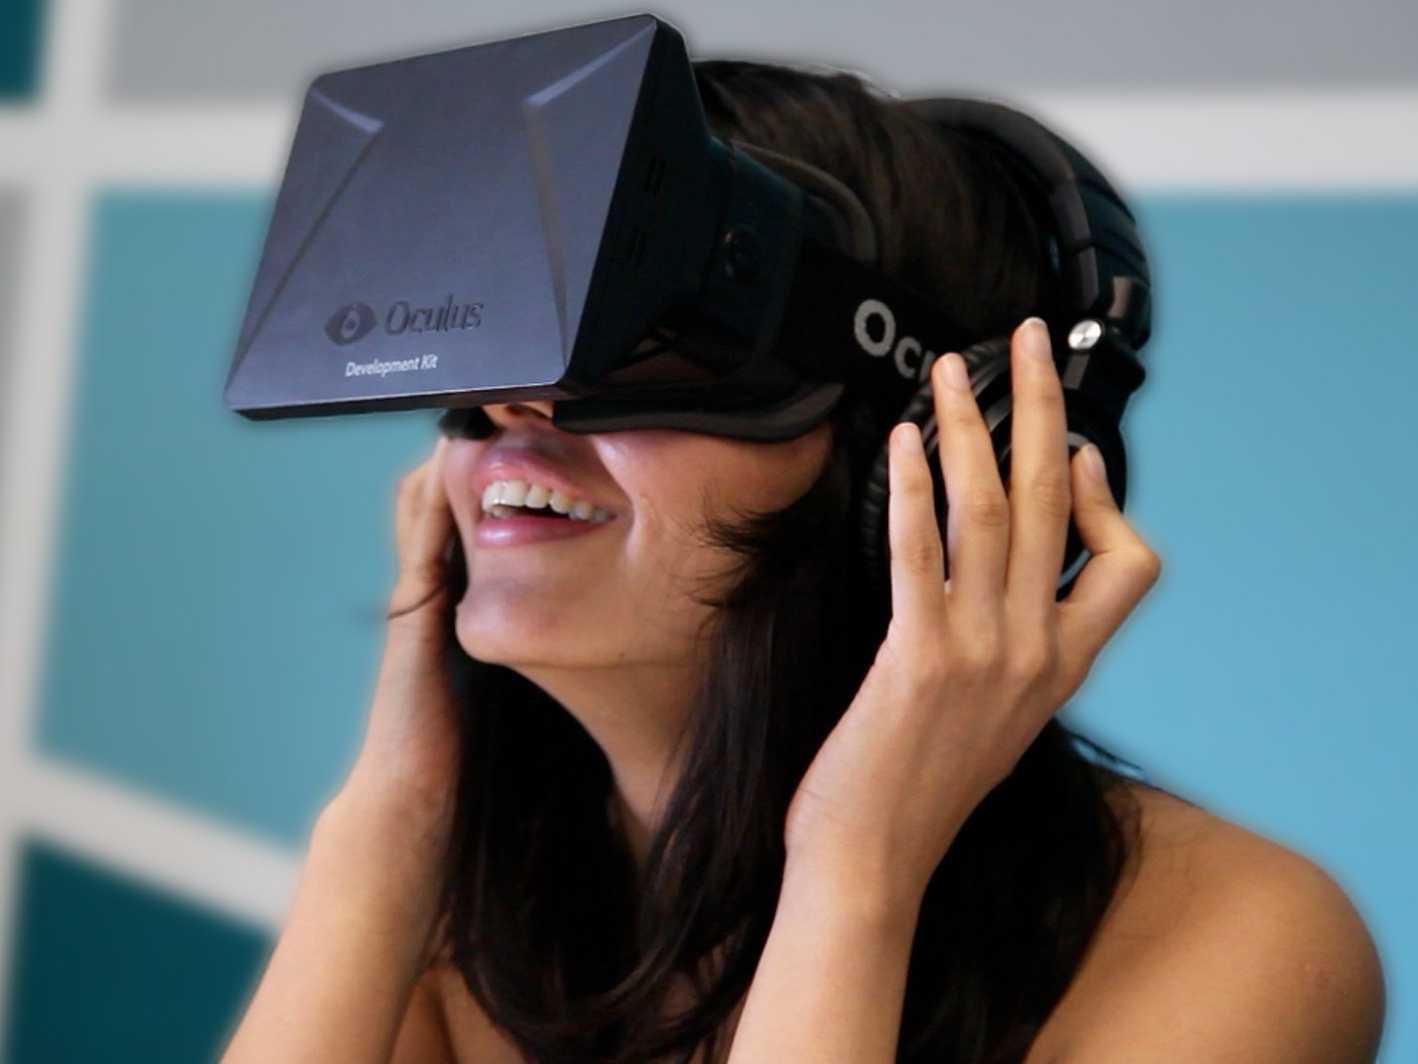 Bude virtuální realita i marketingovou realitou?